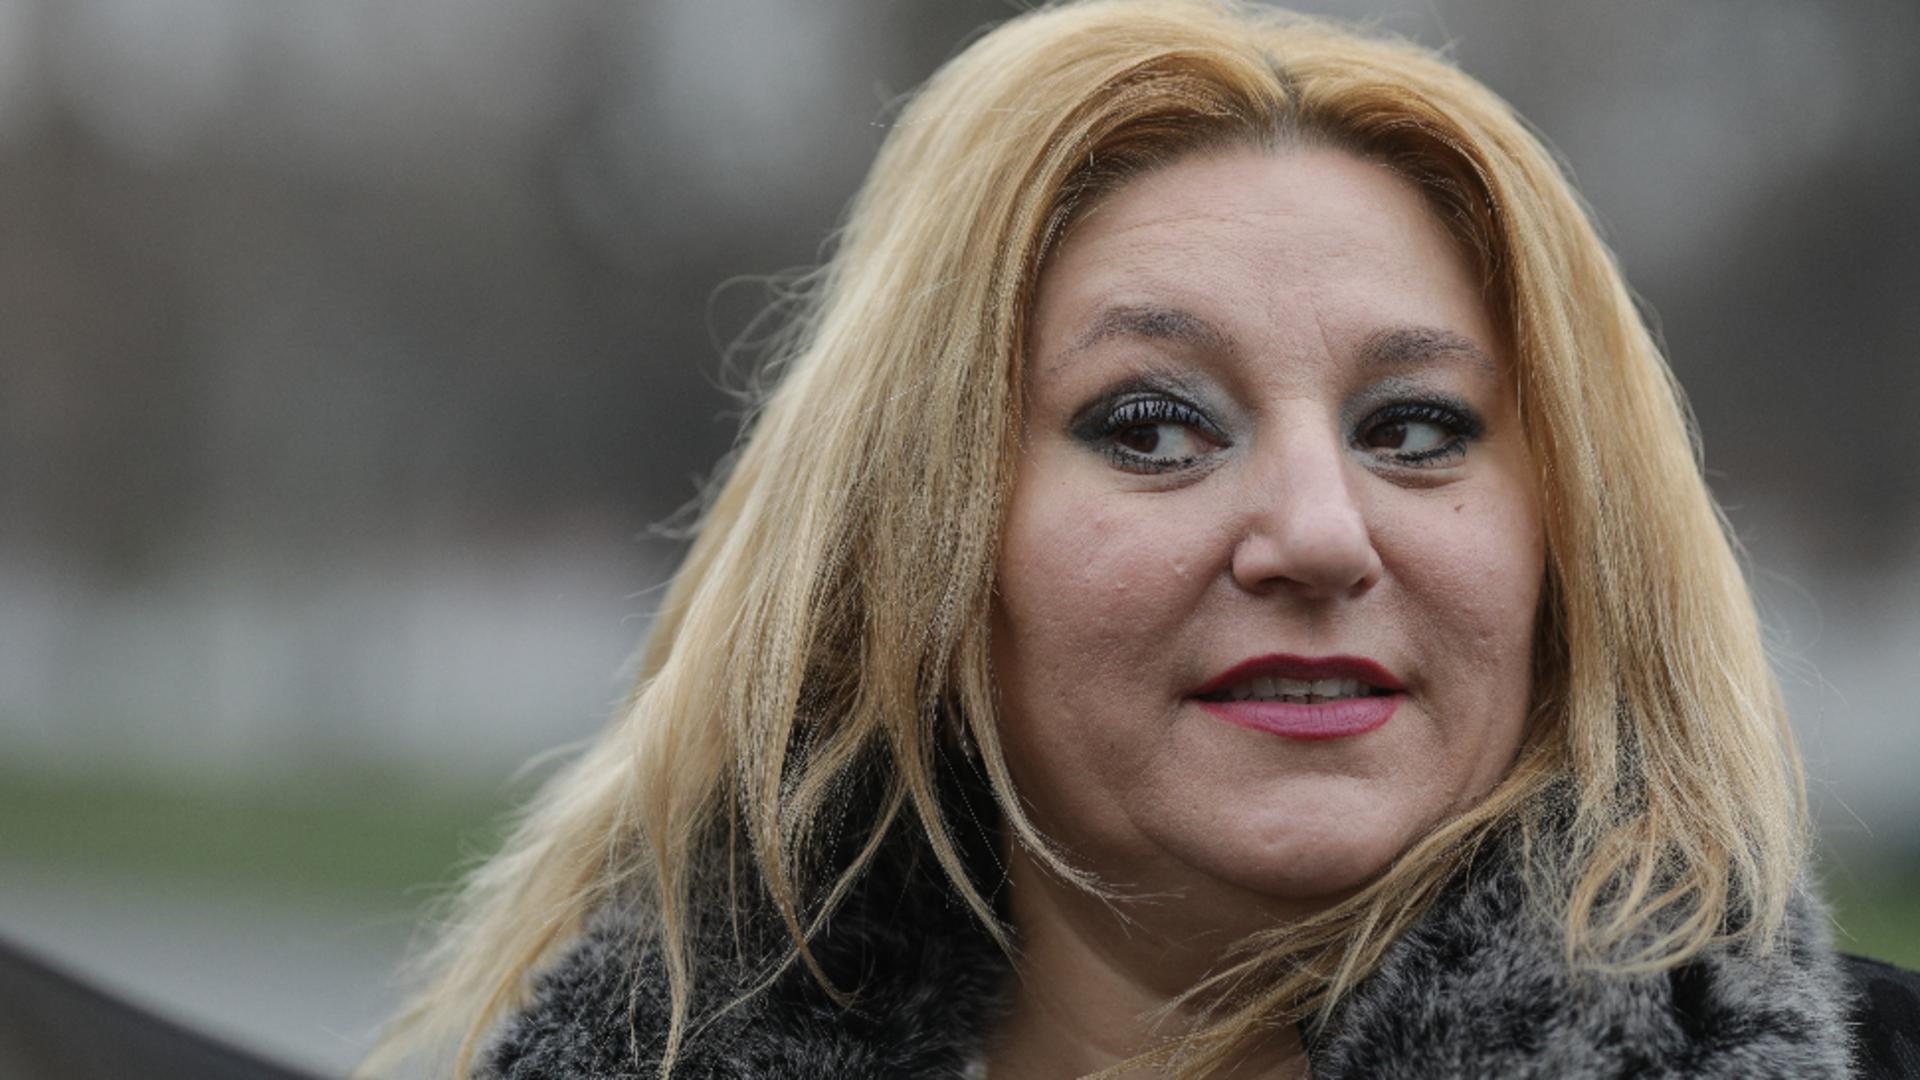 Diana Șoșoacă / Foto: Diana Șoșoacă